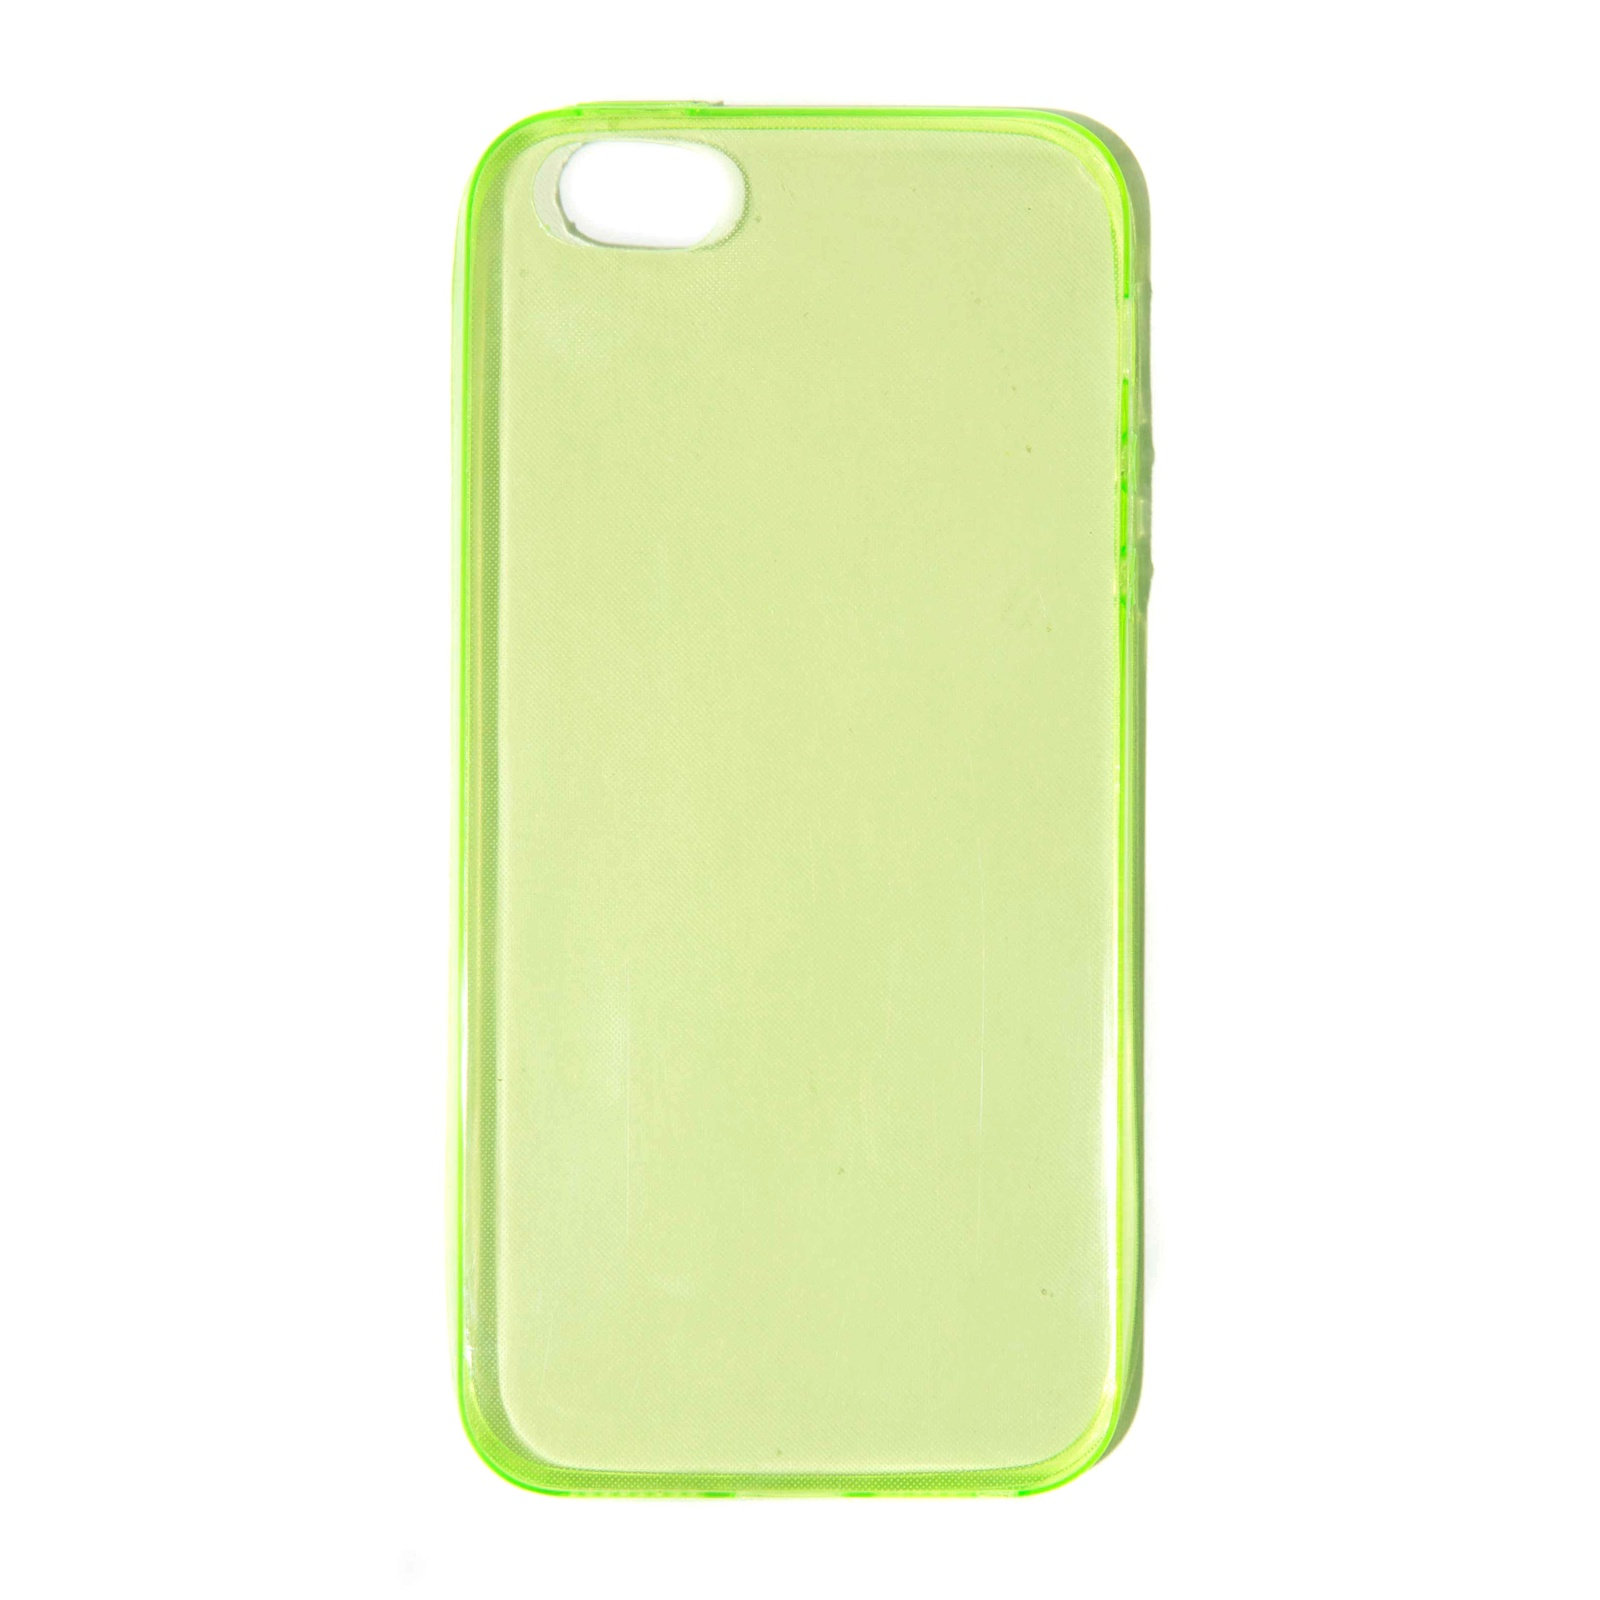 Чехол для сотового телефона Mitya Veselkov CASE, IP6.МITYA-215 все цены